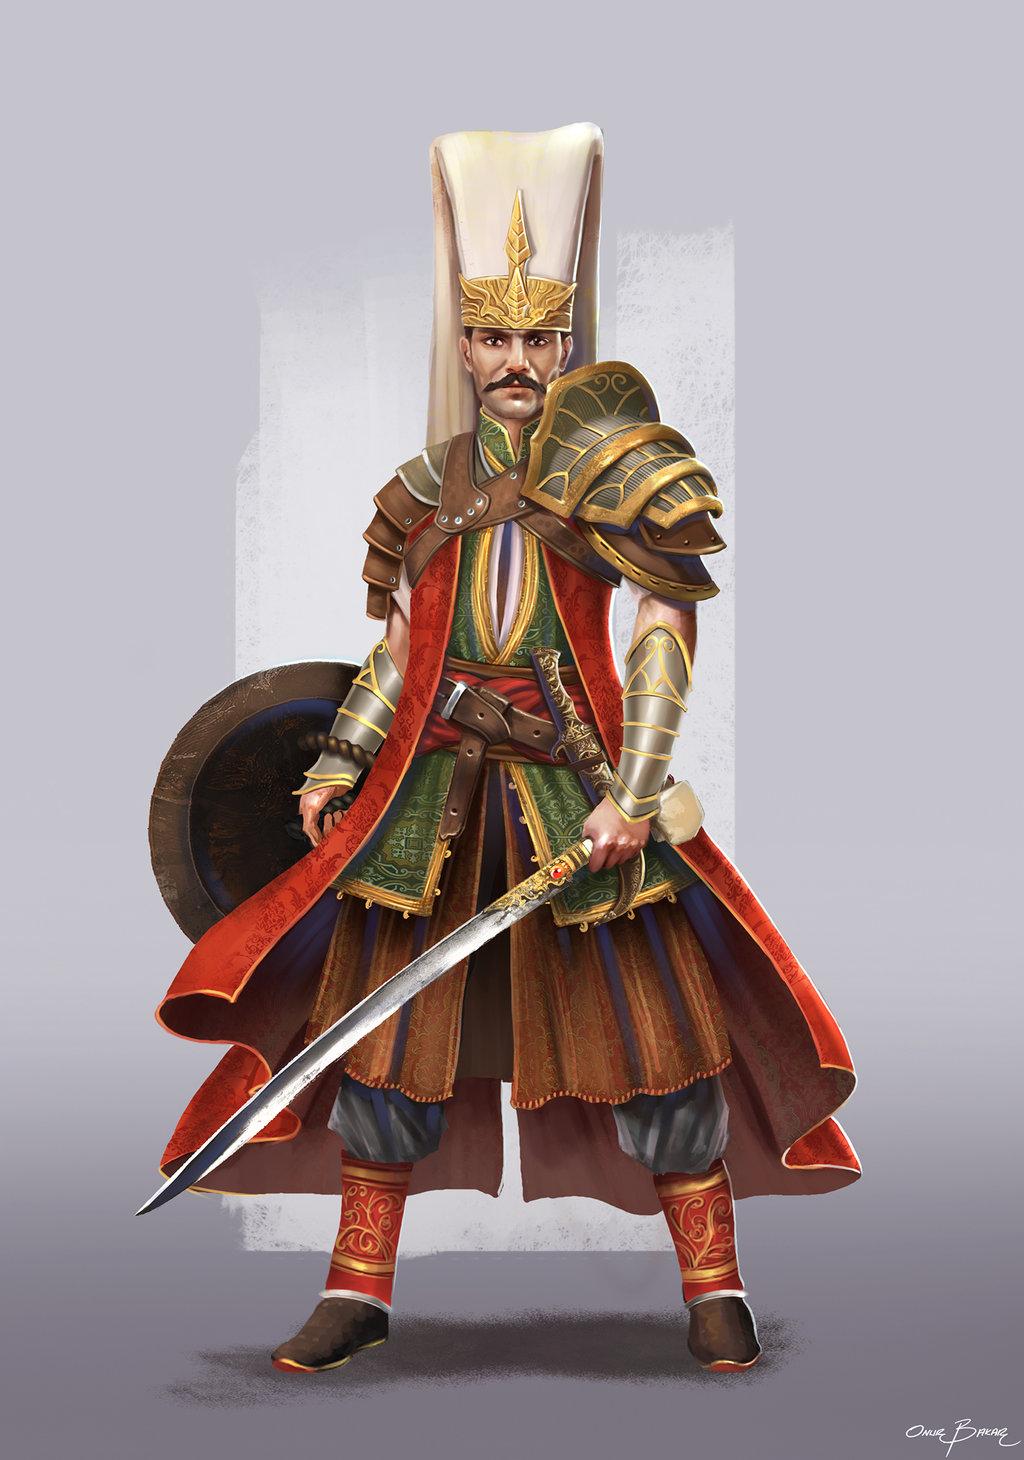 ottoman_wars___janissary_by_bakarov-d9sg556.jpg